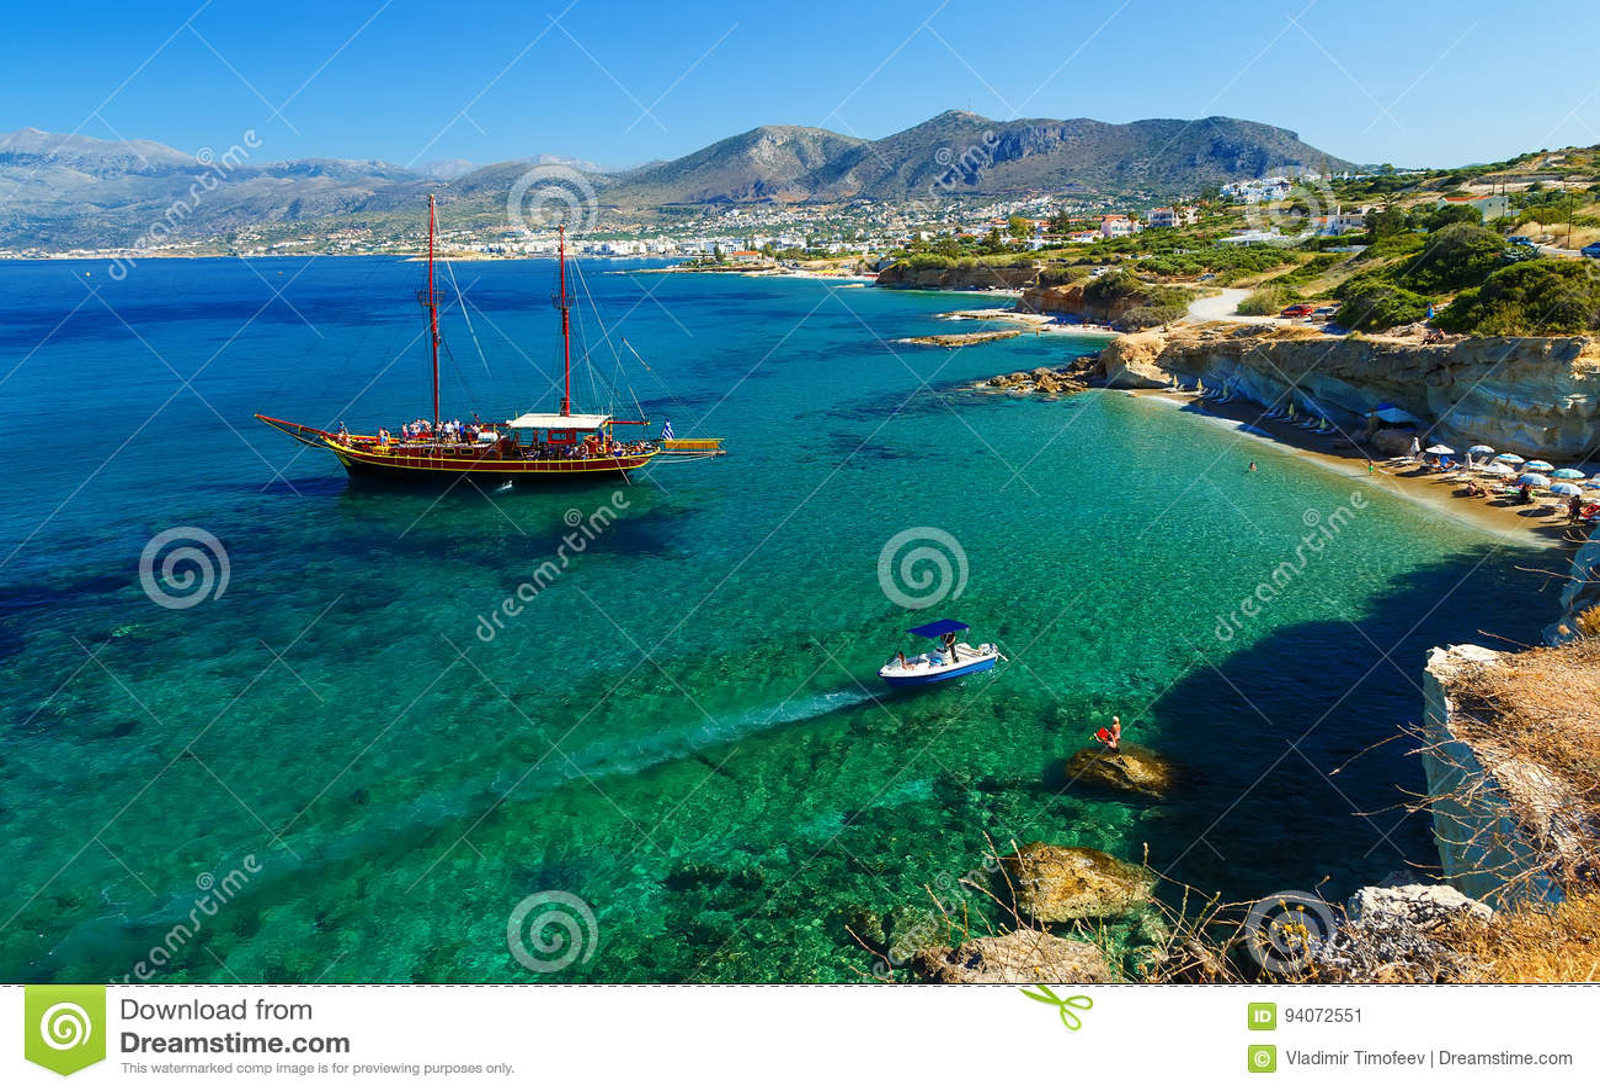 pirate bay.rocks